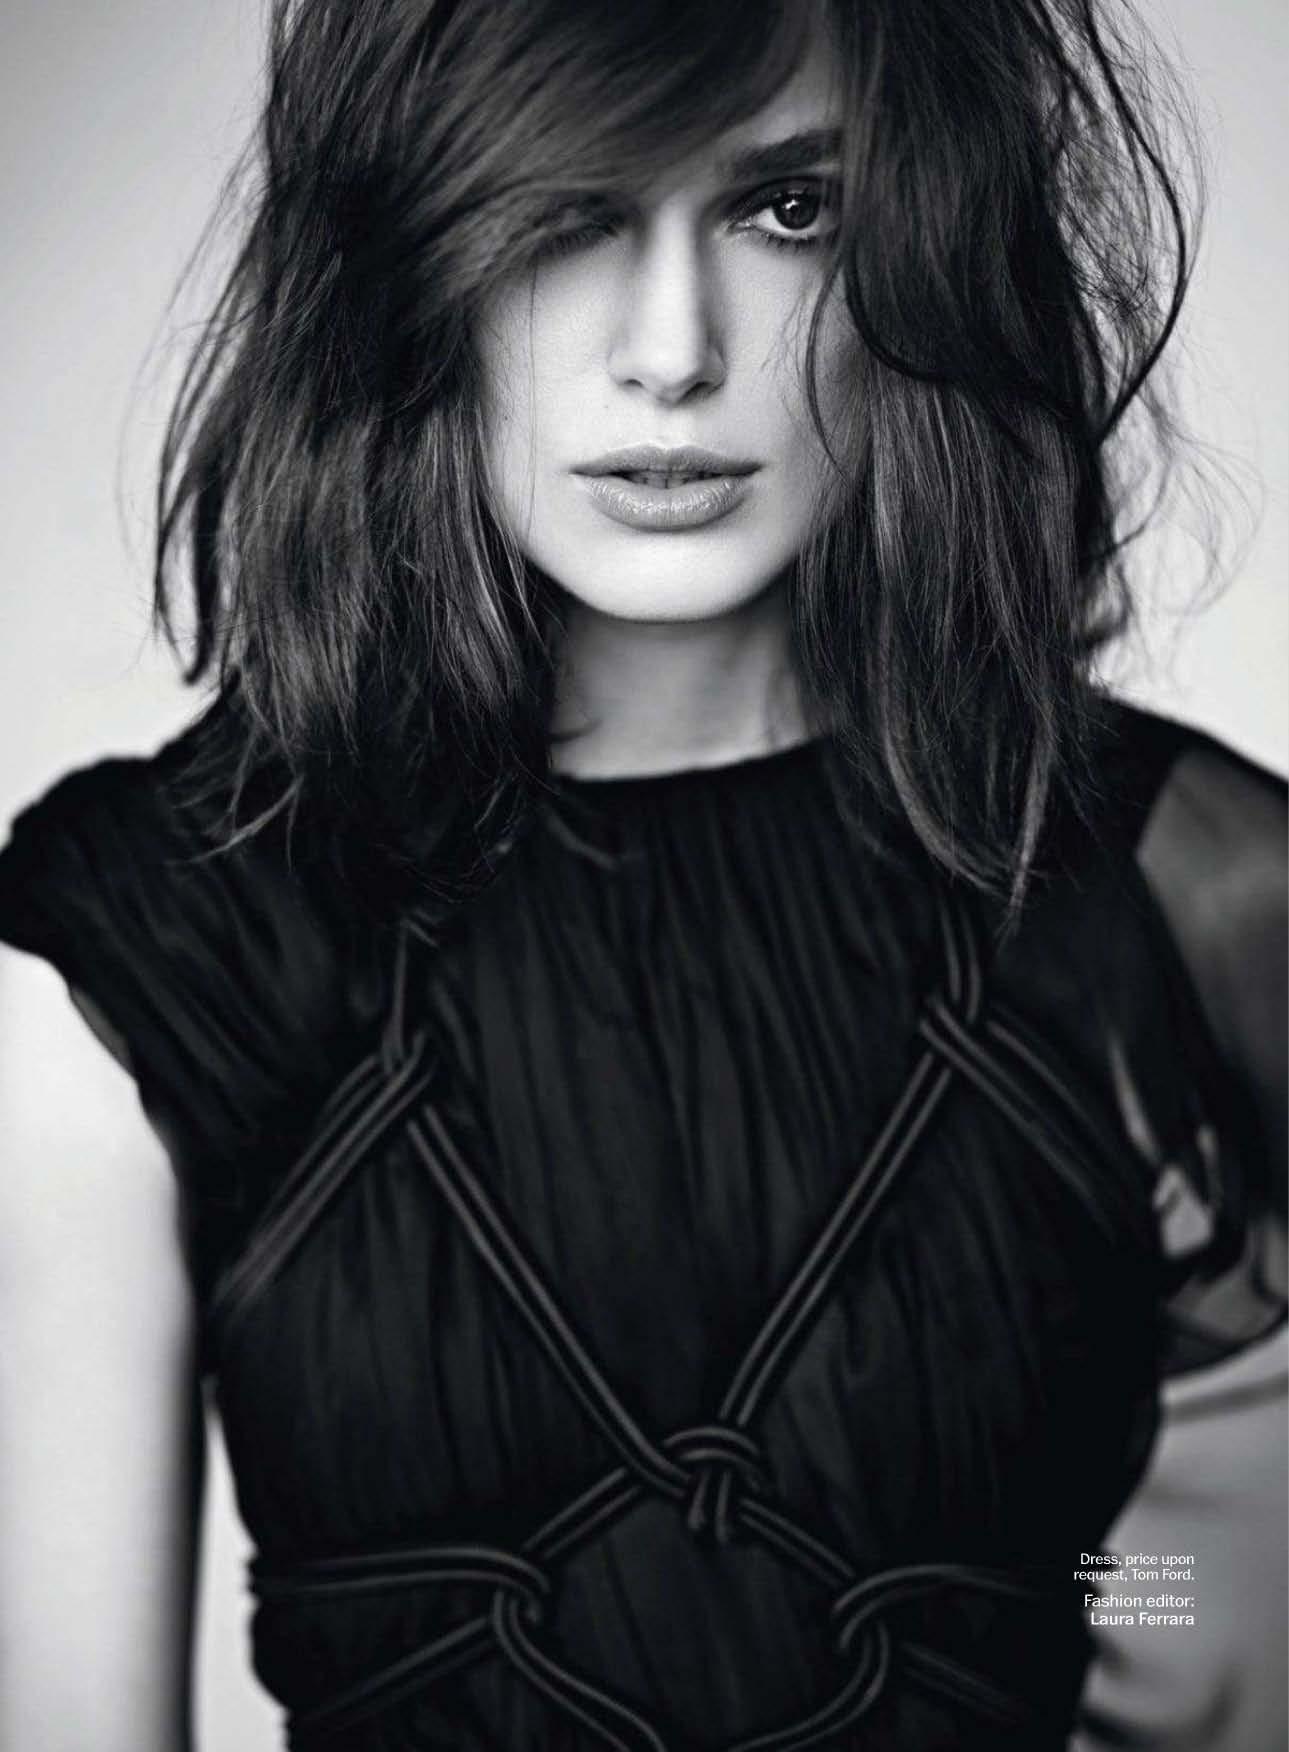 Keira Knightley 2013 : Keira Knightley – Marie Claire Magazine 2013-05